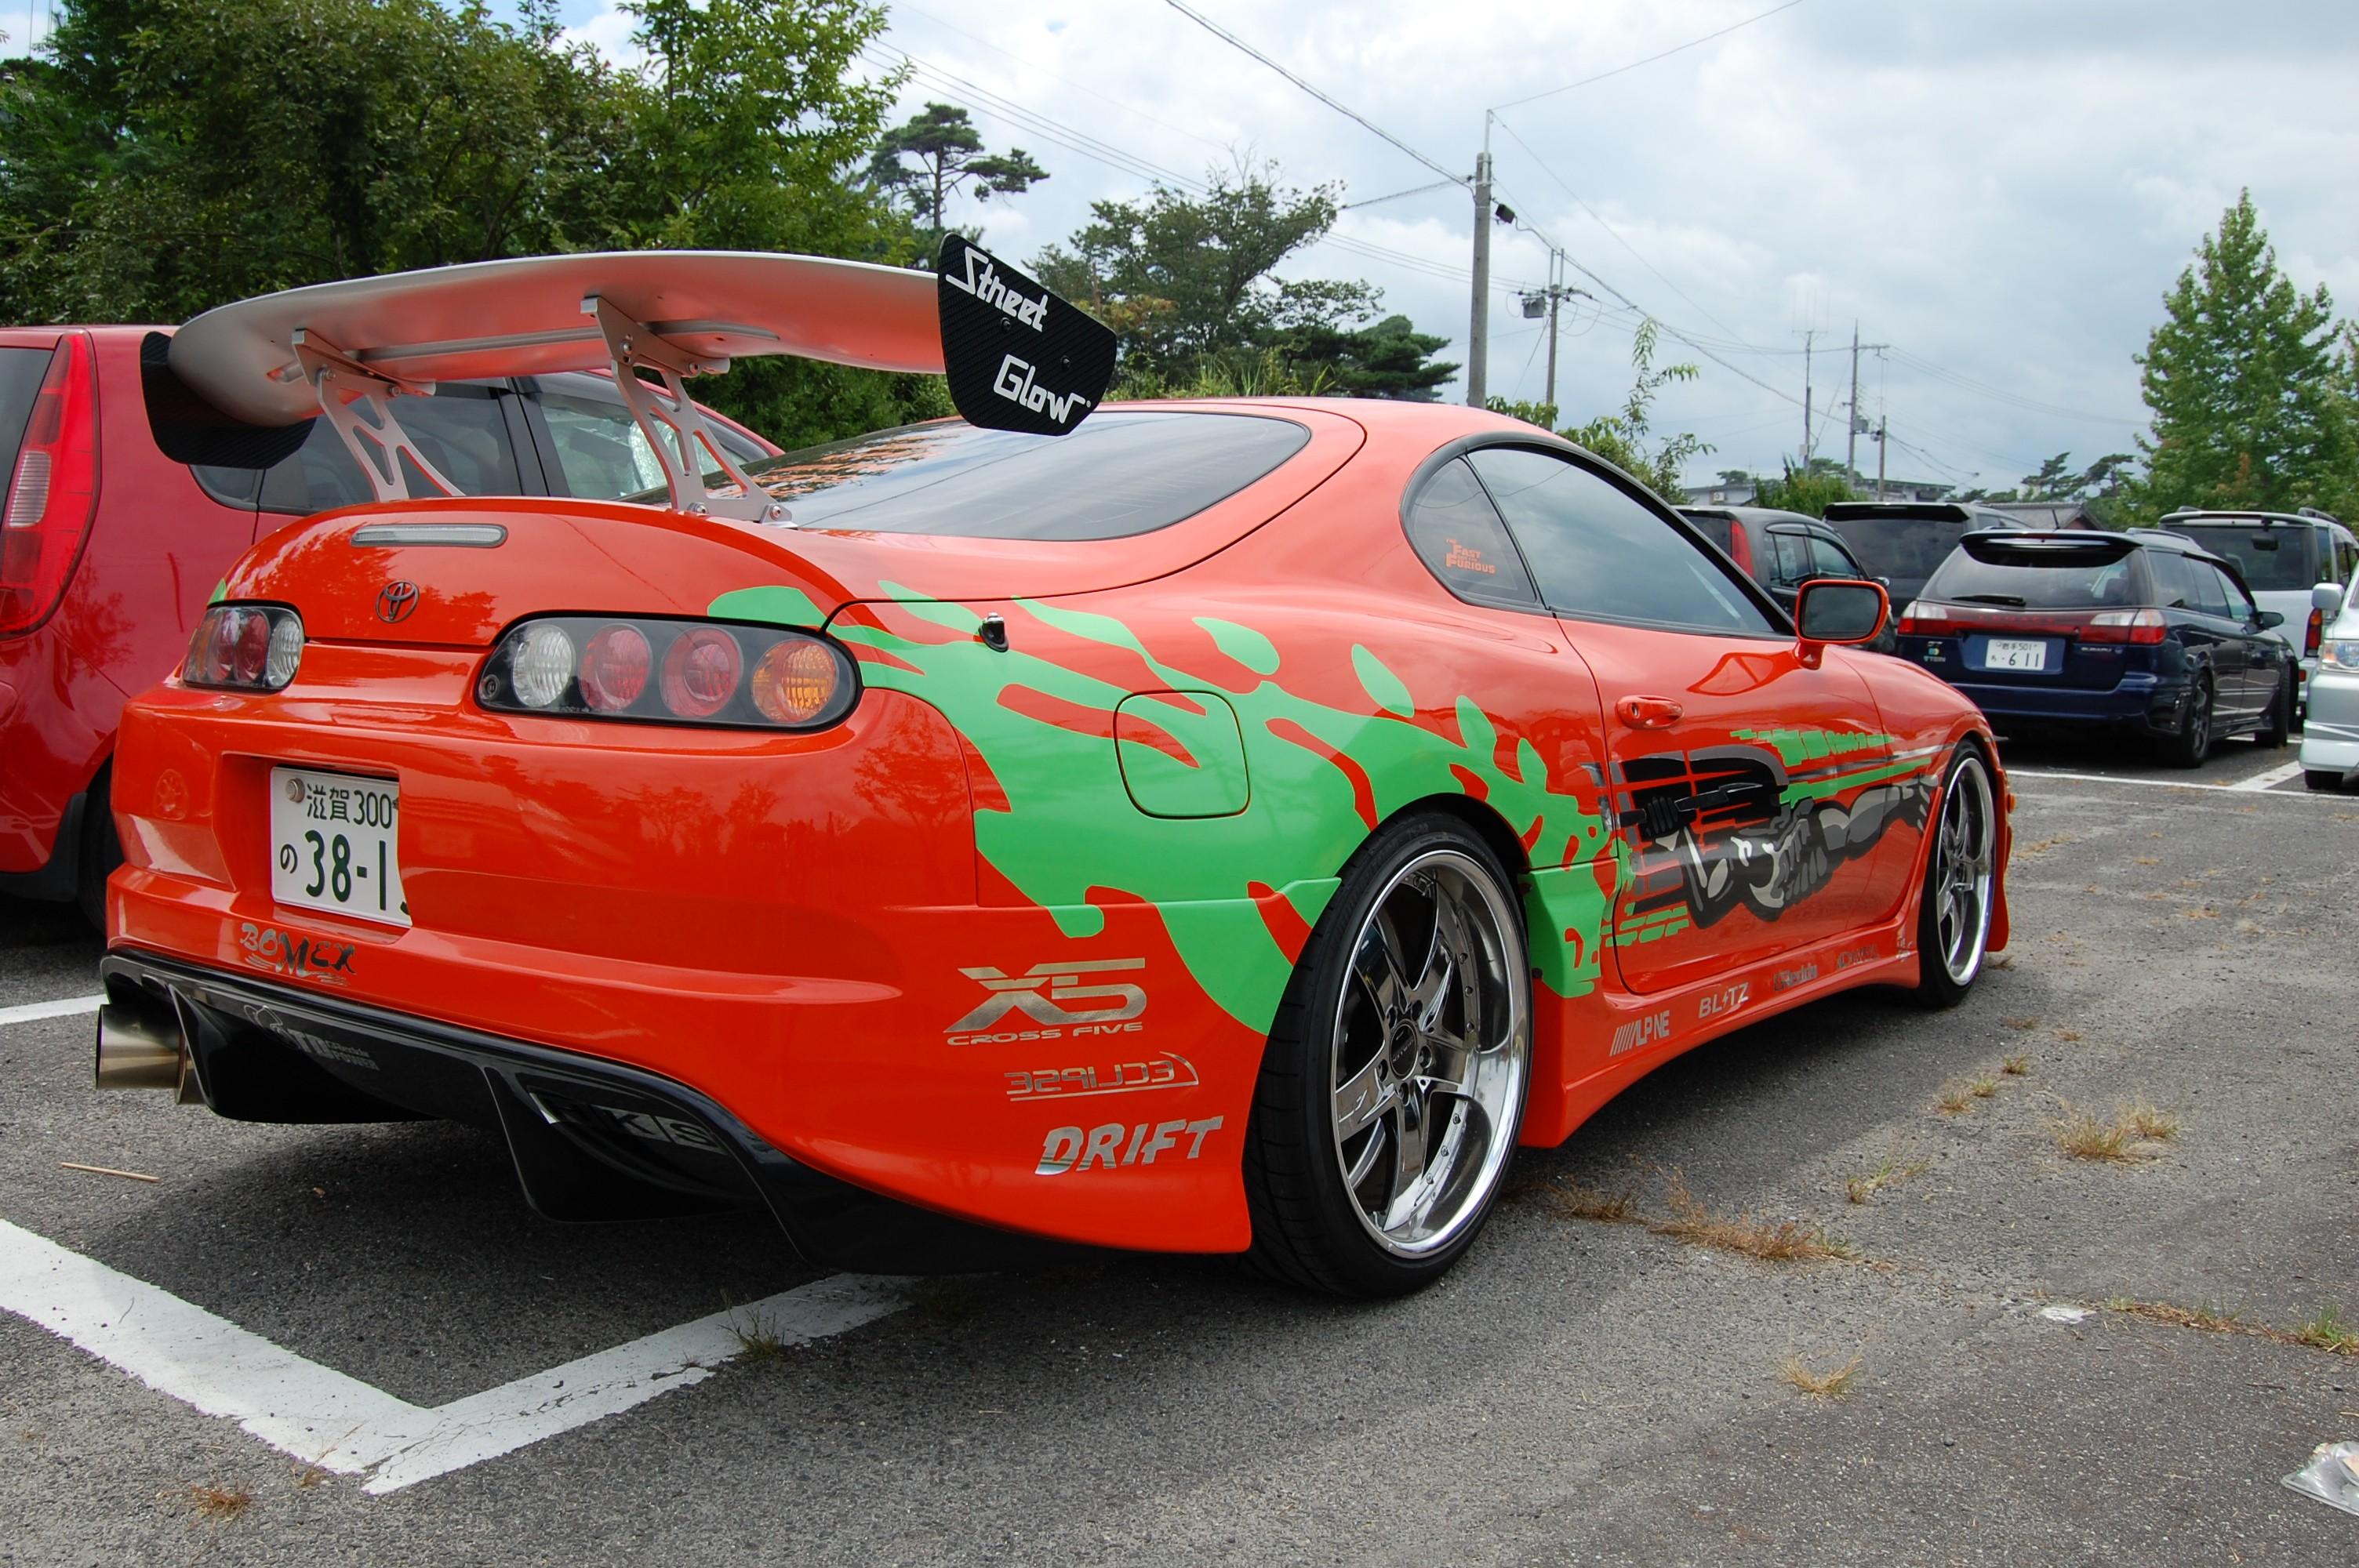 Mazda Furai Vehículos Supercars Hd Fondos De Pantalla: Fondos De Pantalla : Vehículo, Coches Rojos, Coche